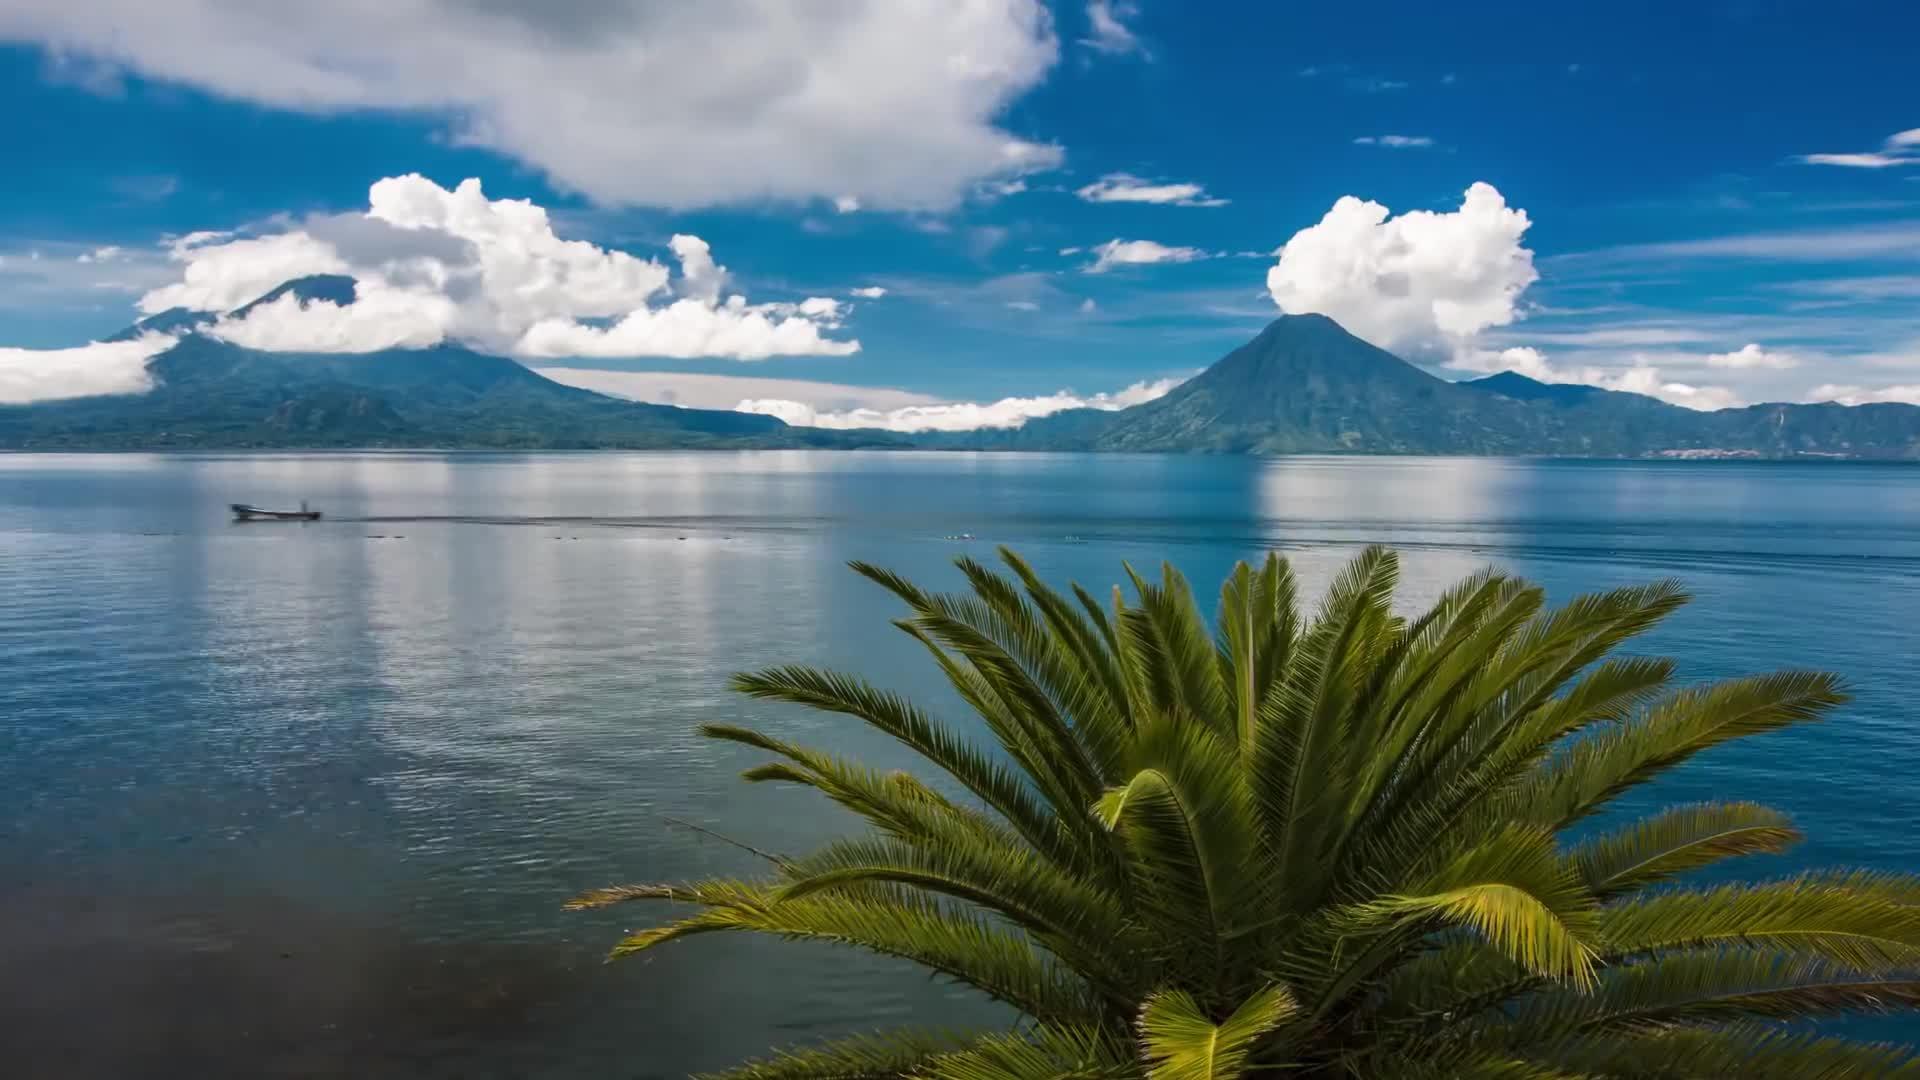 book of mormon, earthgifs, guatemala city (city/town/village), Guatemala - Land of Eternal Spring! in 4K! GIFs